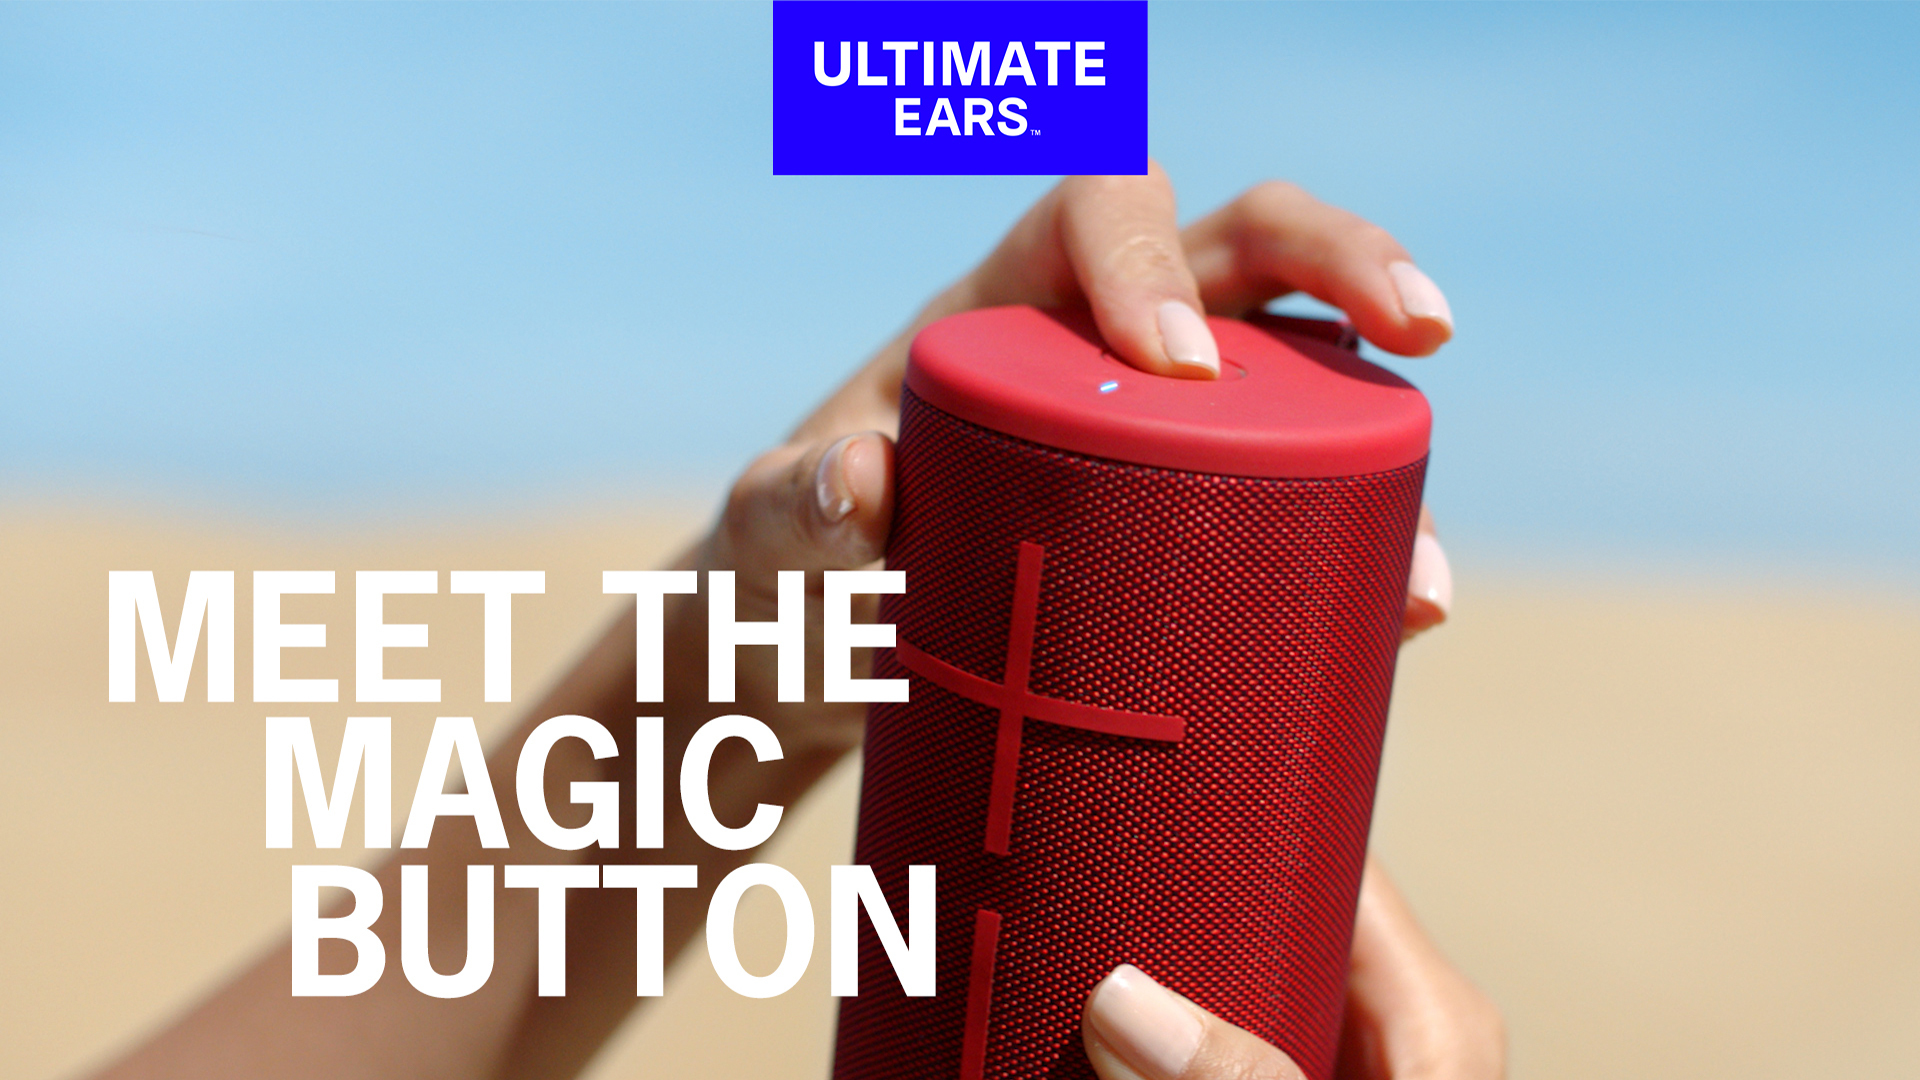 ultimate ears magic button